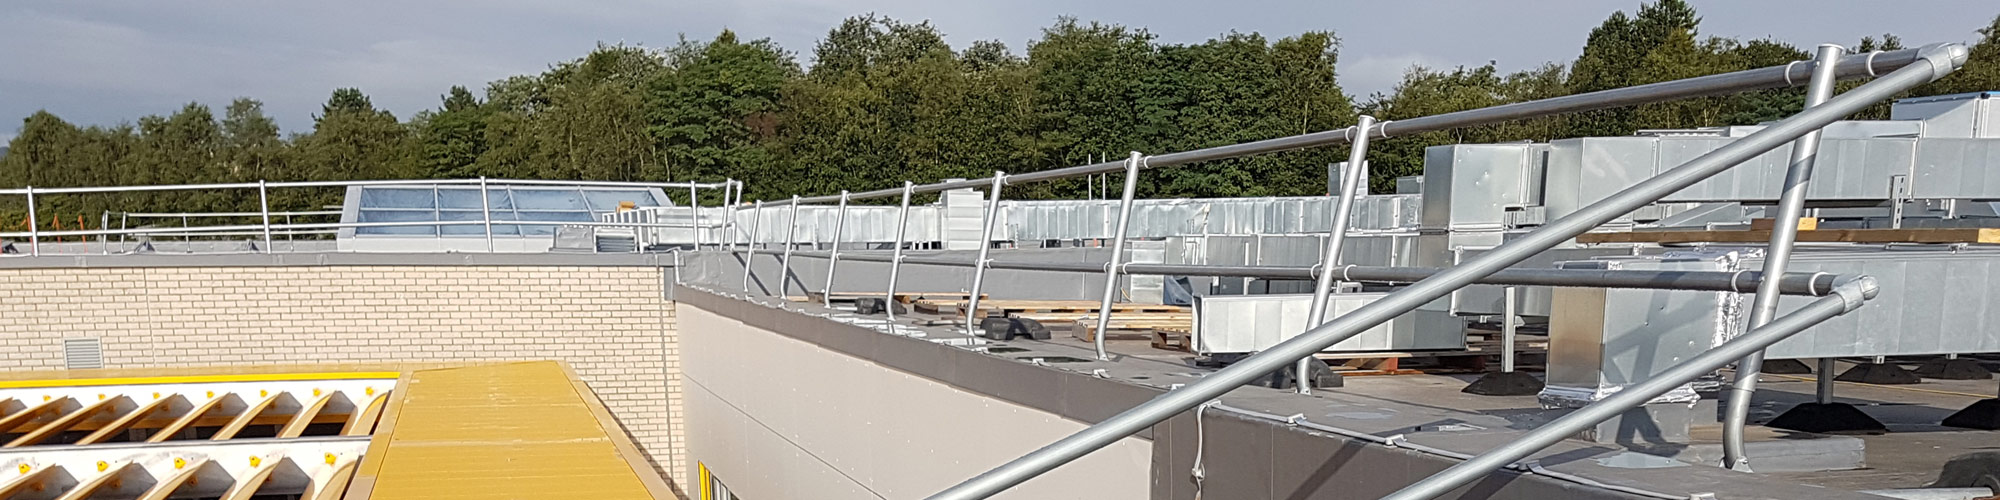 PentrehafodSchool Roof Guardrail Project